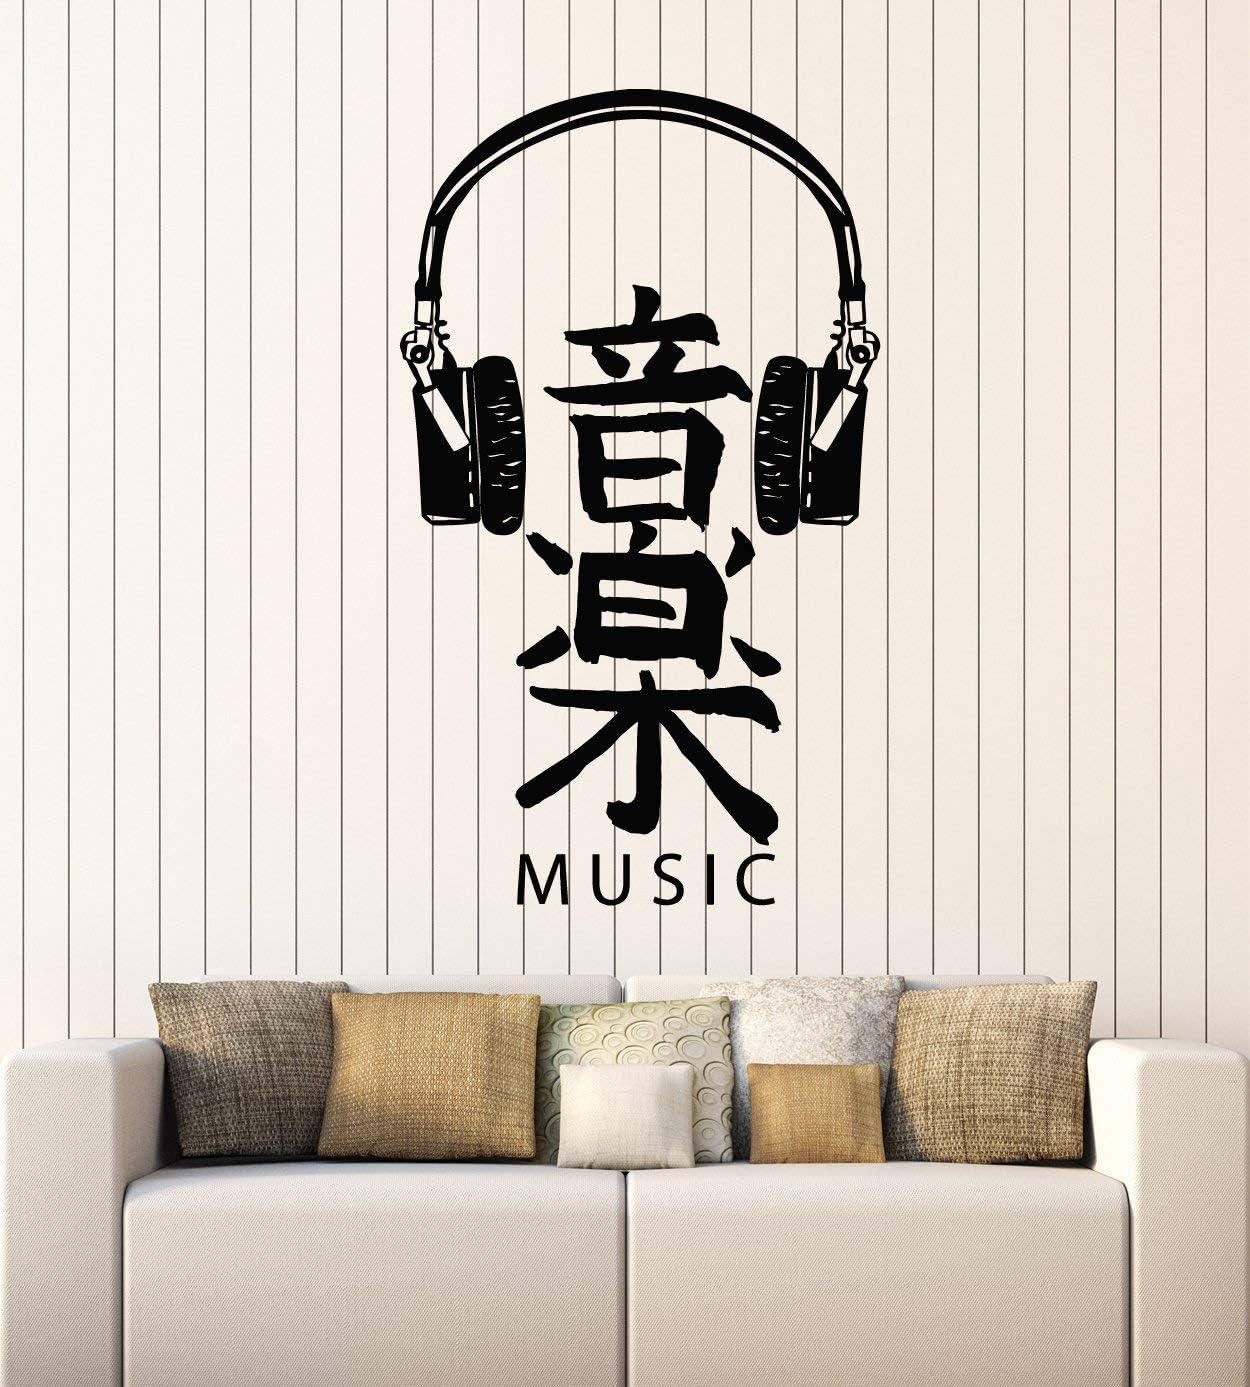 Vinyl 希望者のみラッピング無料 Wall Decal Word Hieroglyph Room Teenager 正規激安 Headphones Music